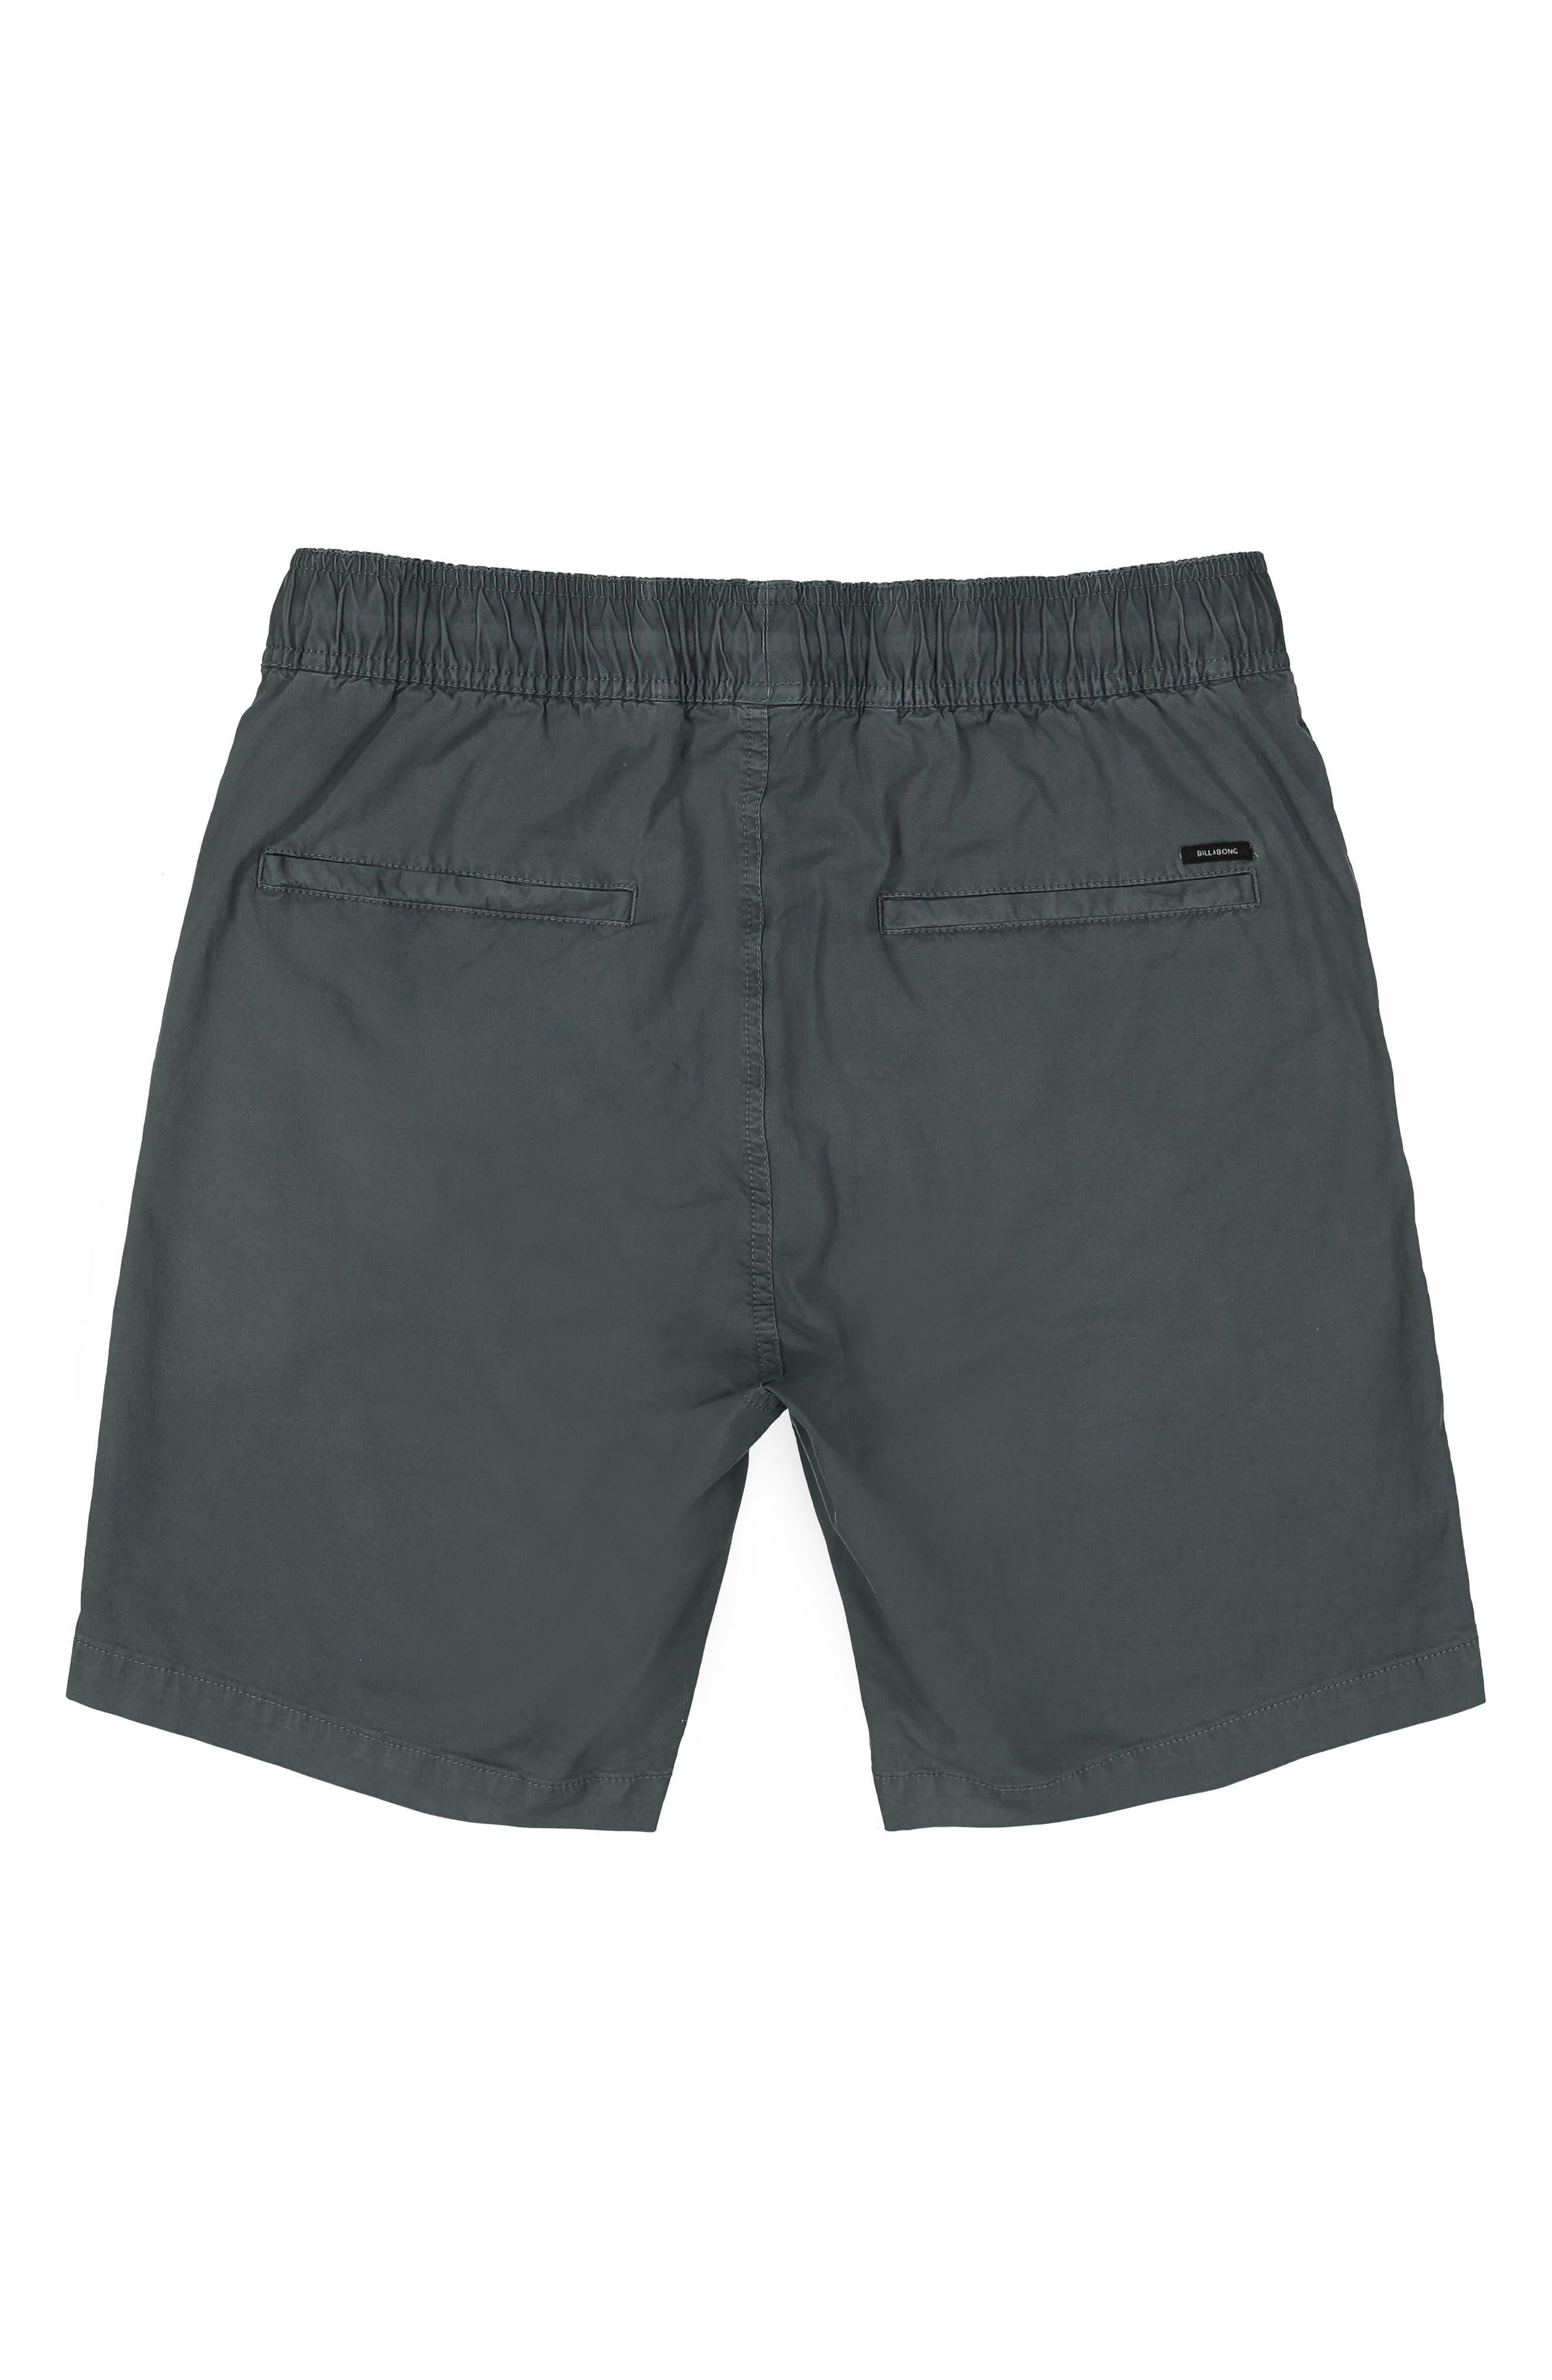 BILLABONG,                             Larry Layback Stretch Cotton Shorts,                             Alternate thumbnail 2, color,                             WASHED SLATE